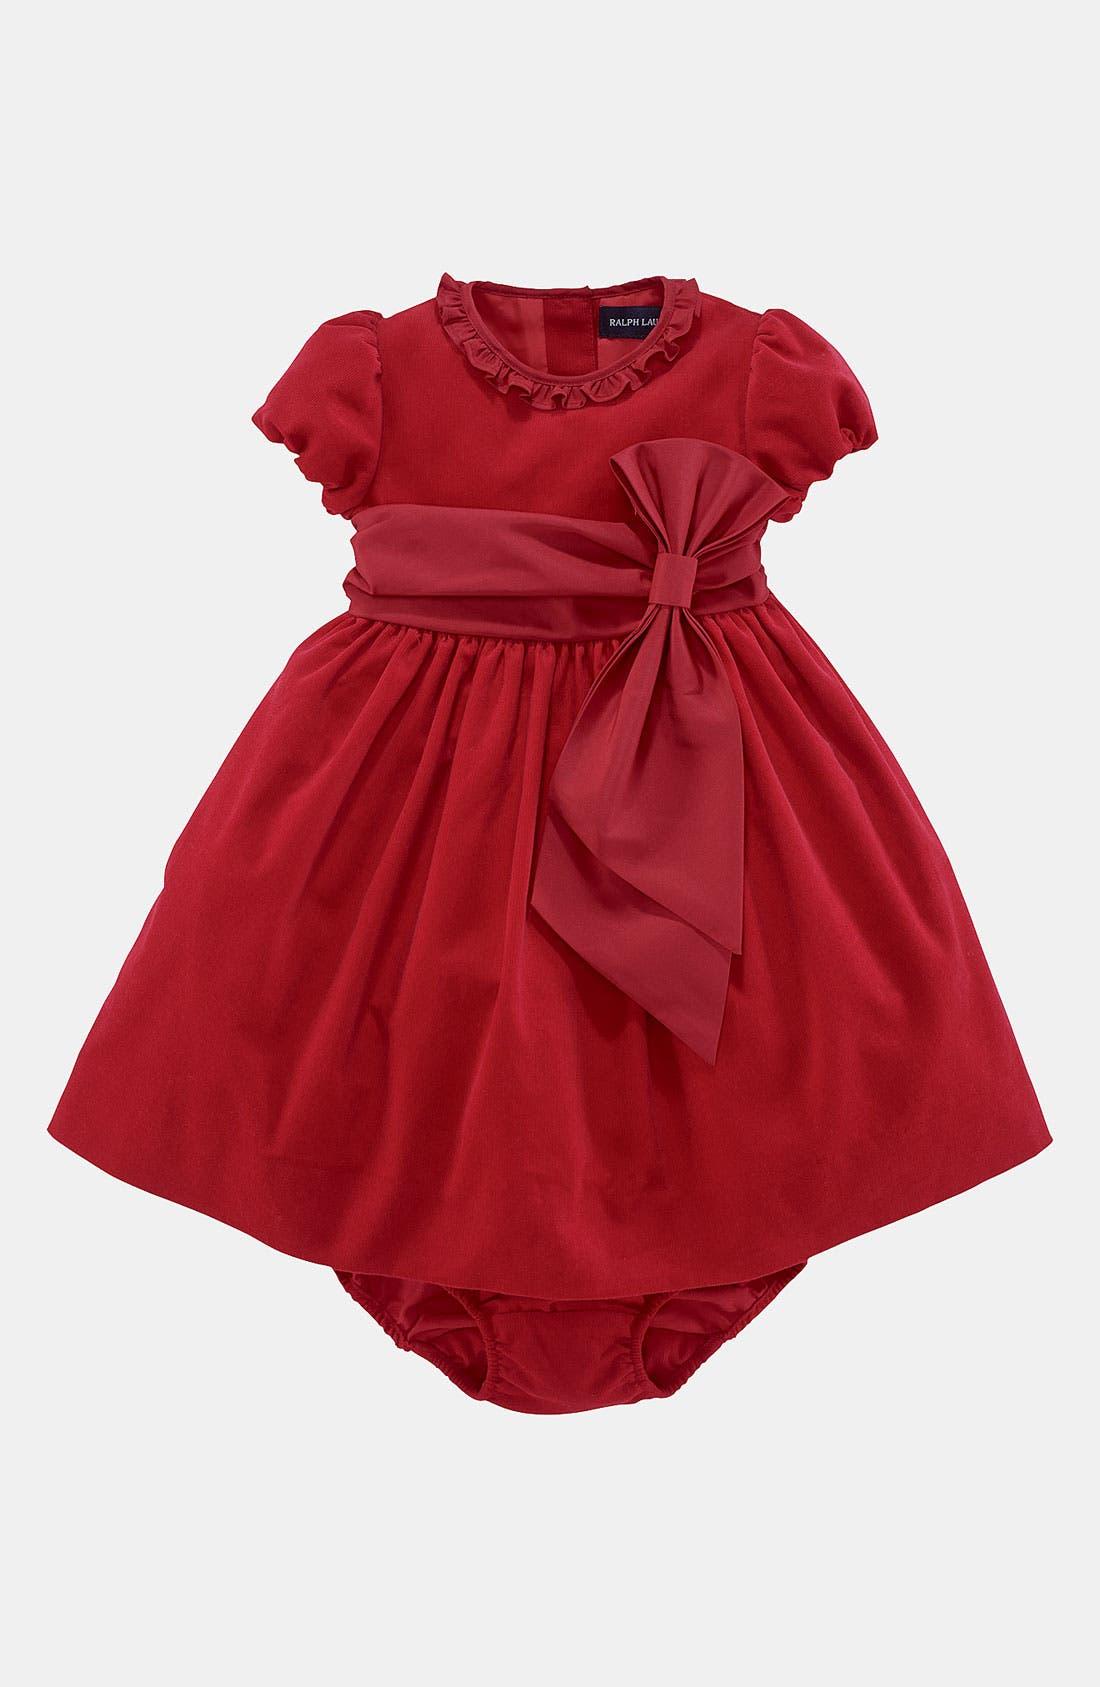 Alternate Image 1 Selected - Ralph Lauren Corduroy Dress (Infant)